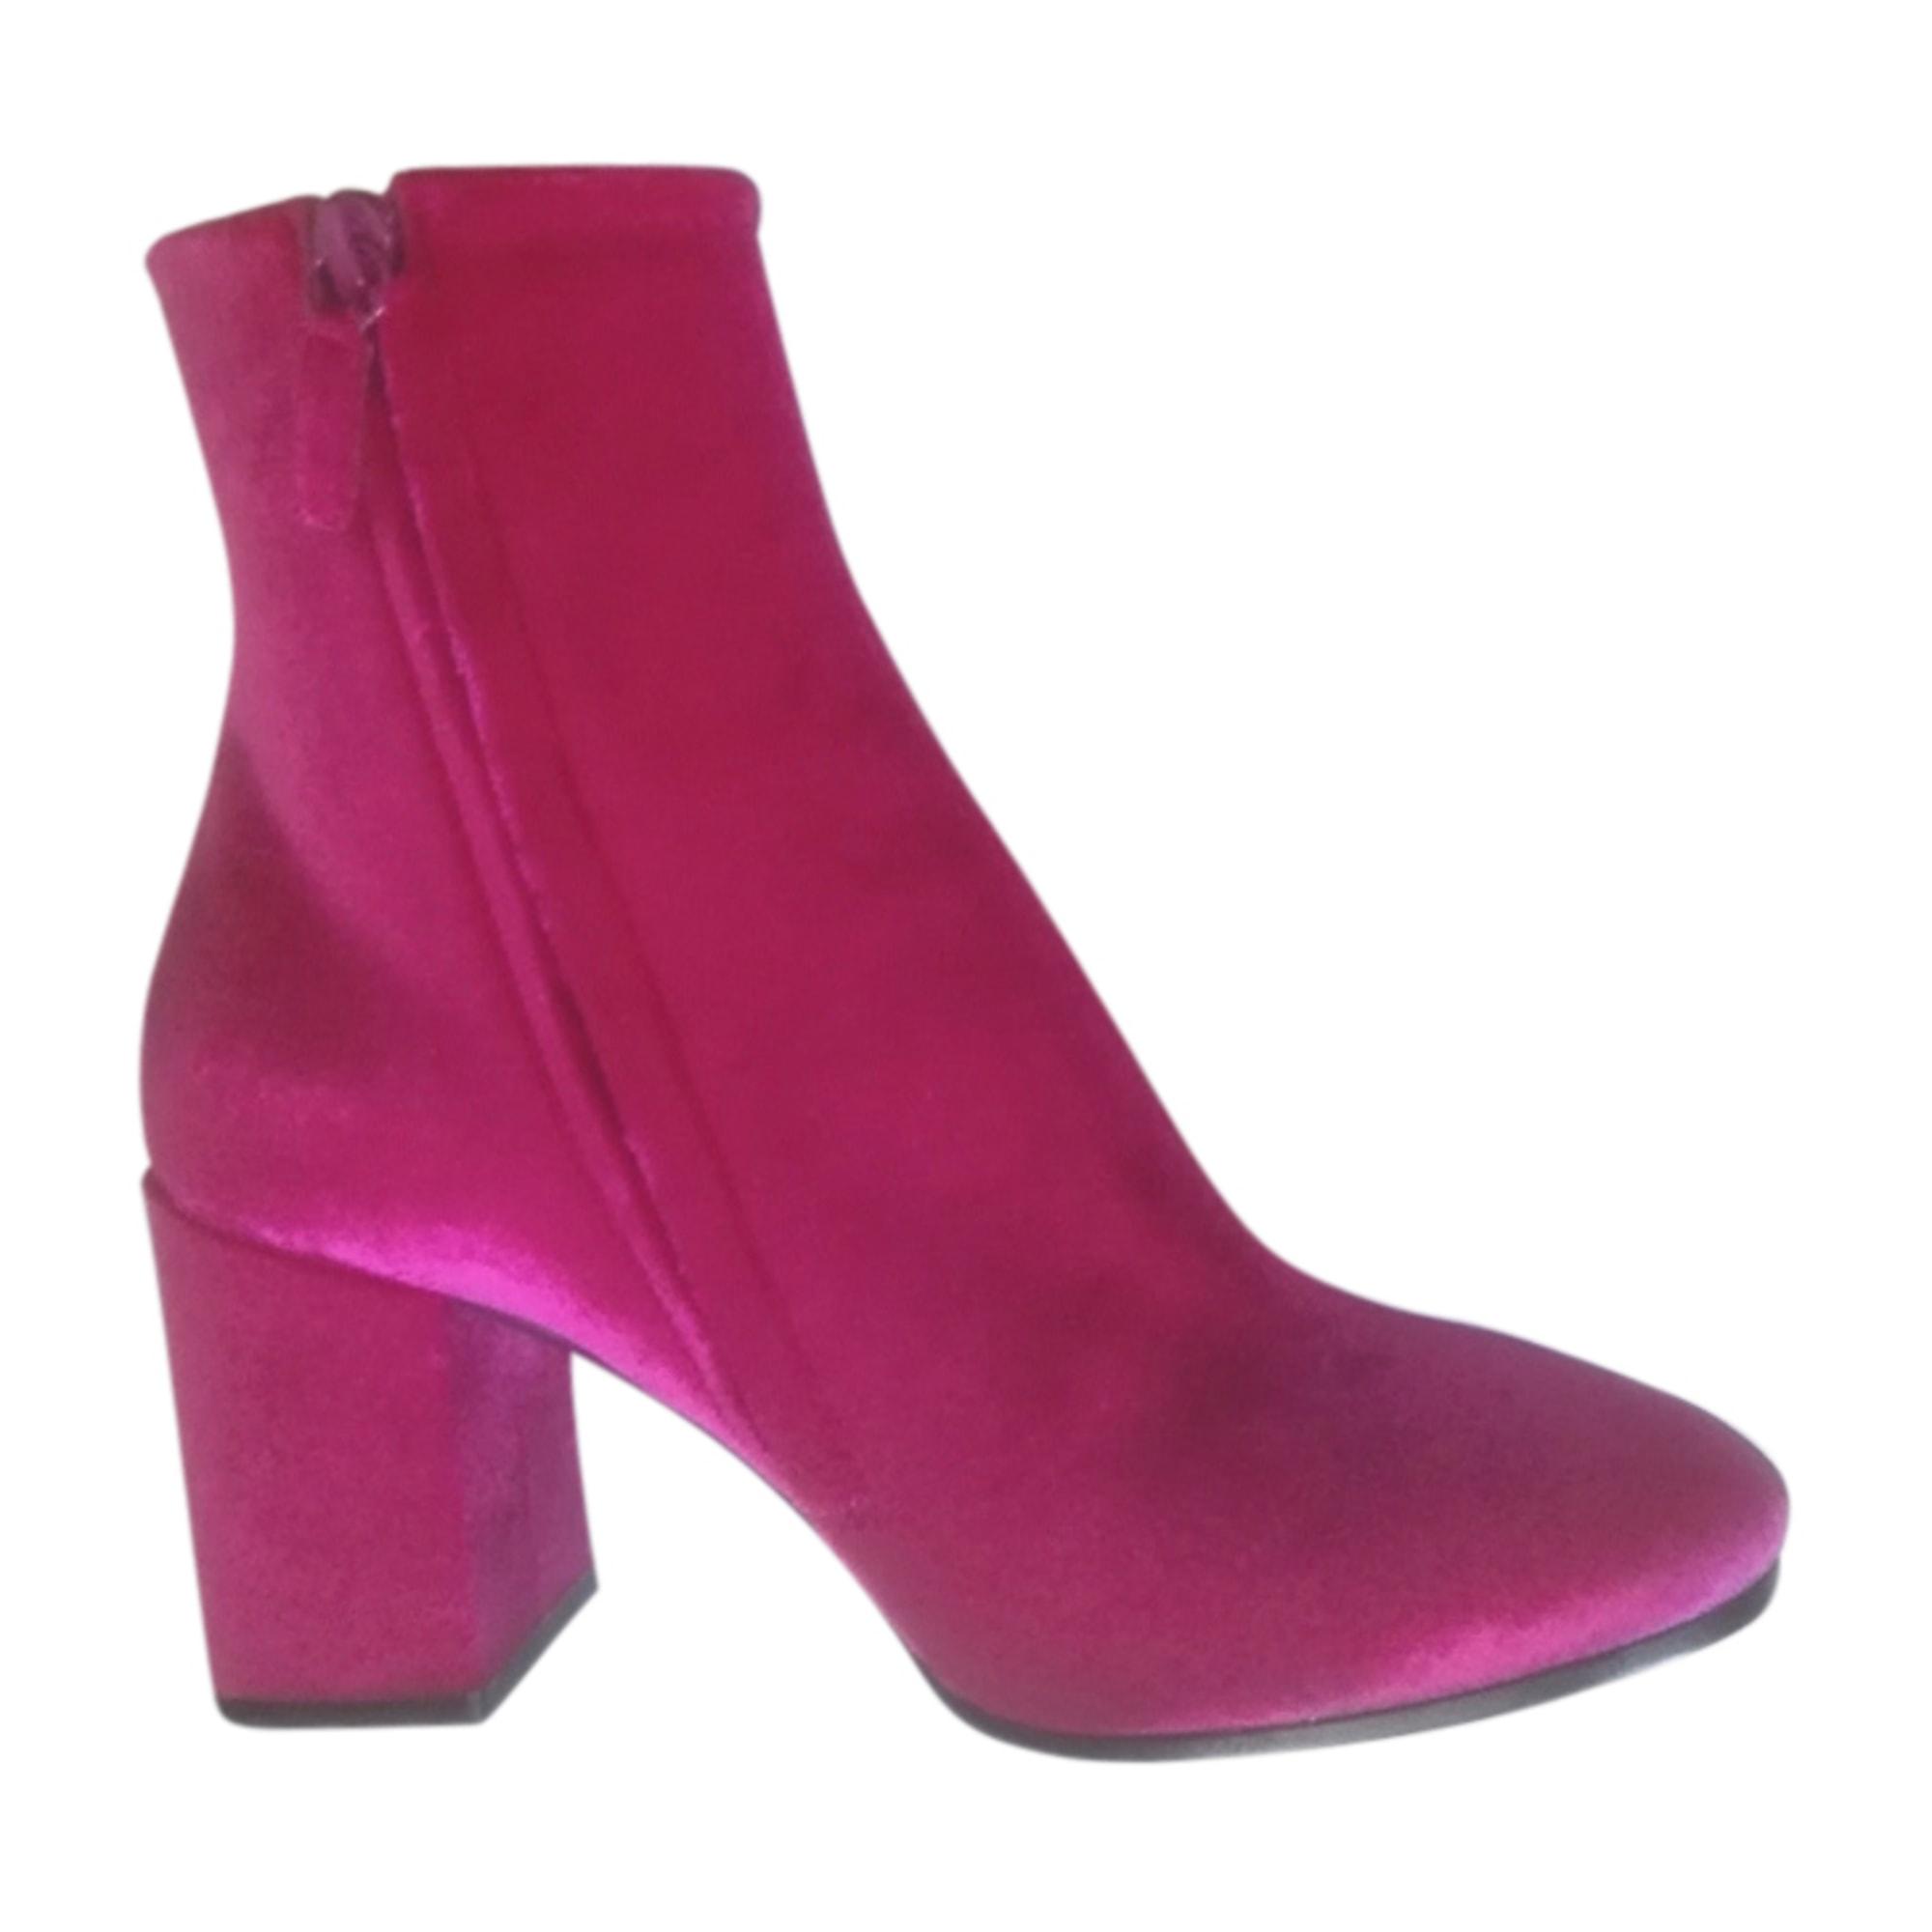 High Heel Ankle Boots BALENCIAGA Pink, fuchsia, light pink